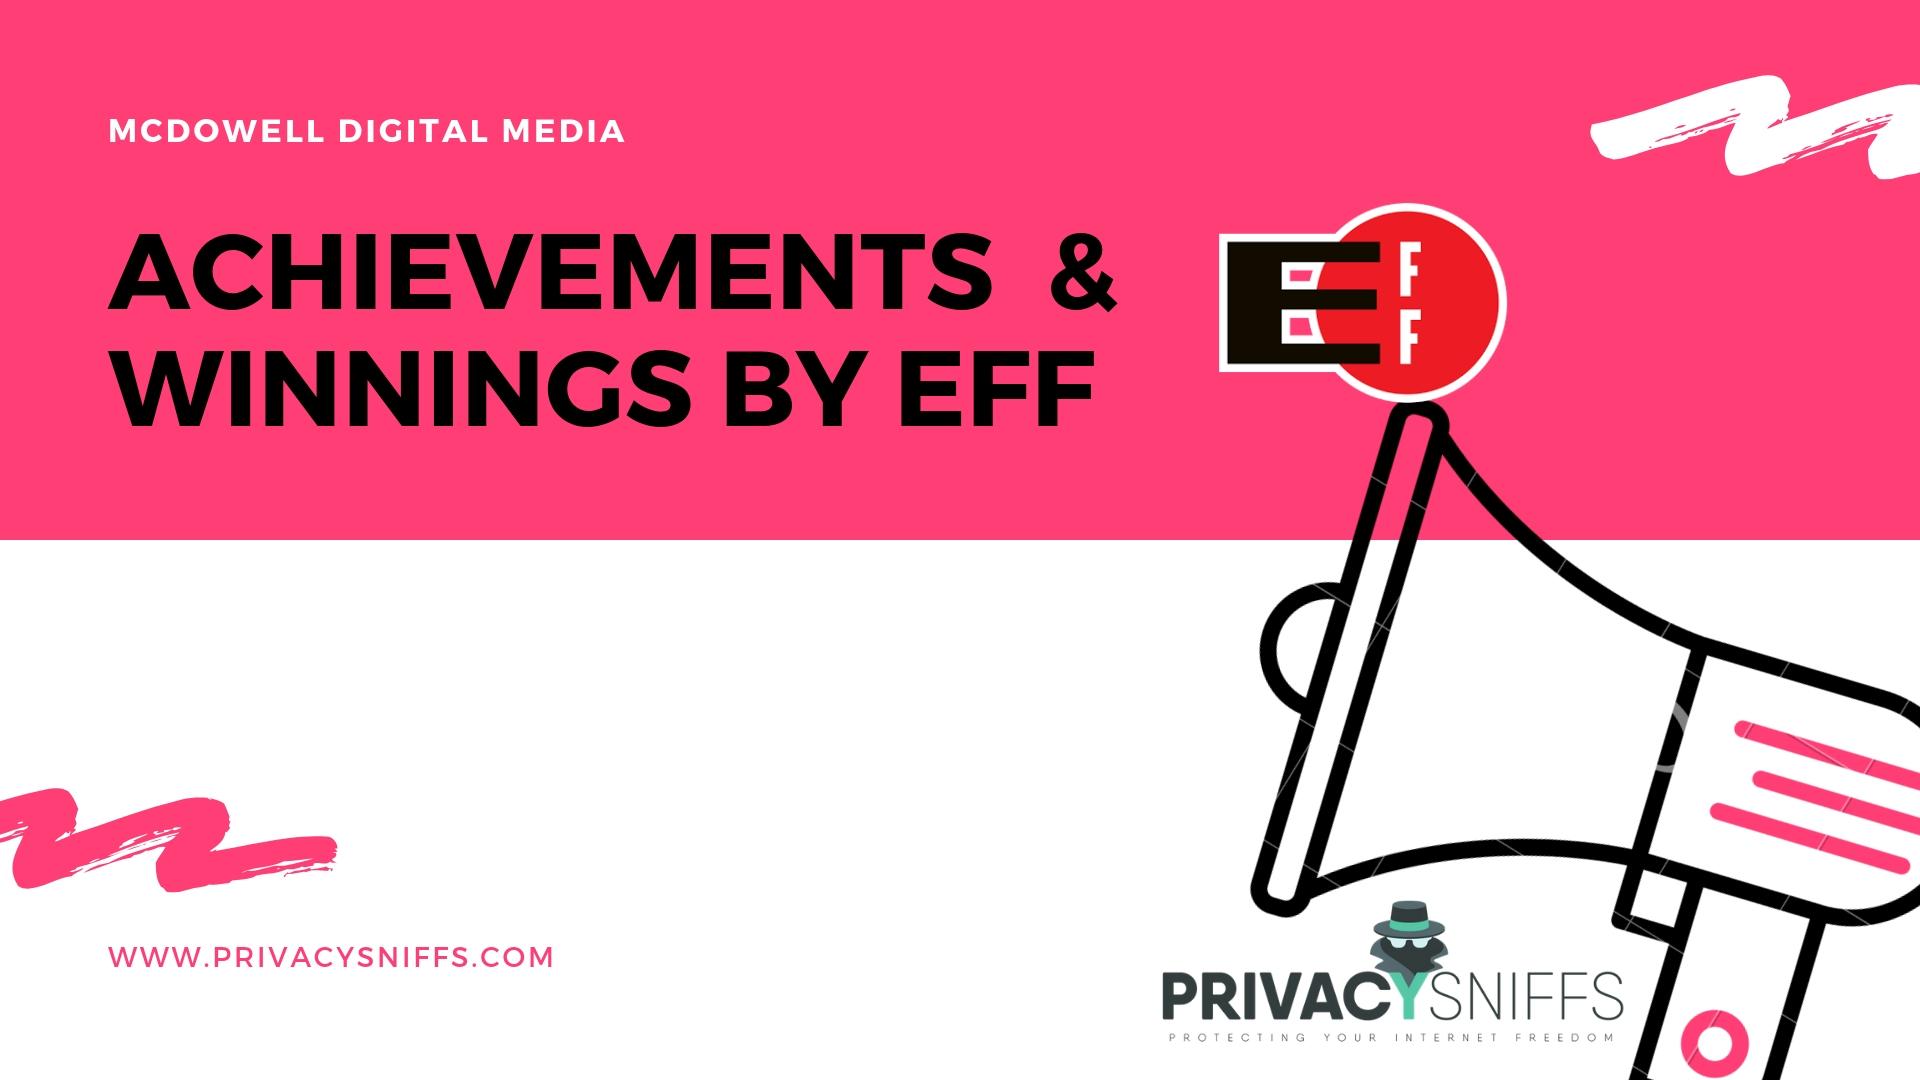 eff achievements